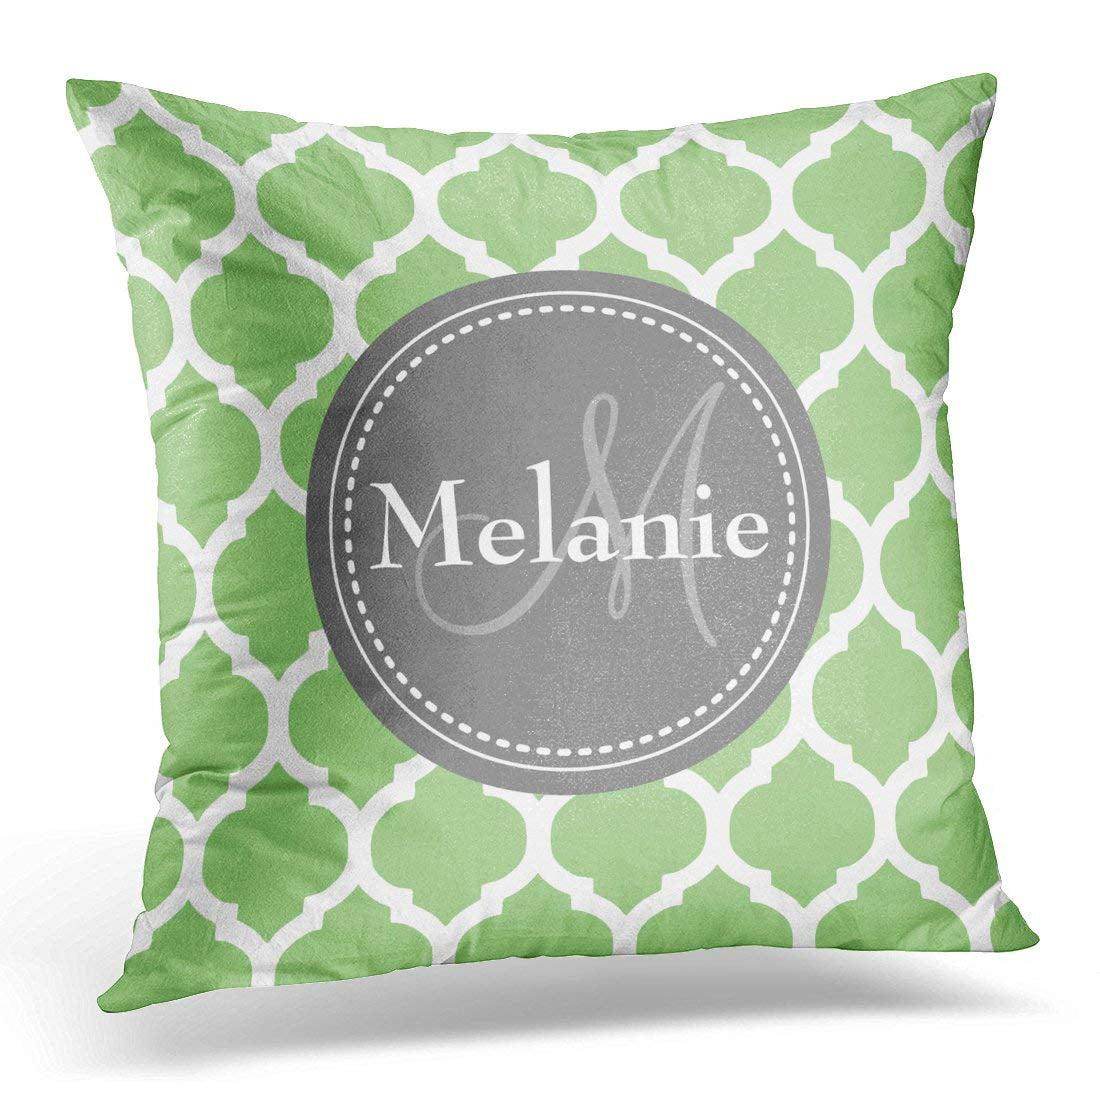 WOPOP Gray Cool Monogrammed Sage Green Quatrefoil White Pillowcase Cushion Cover 18x18 inches